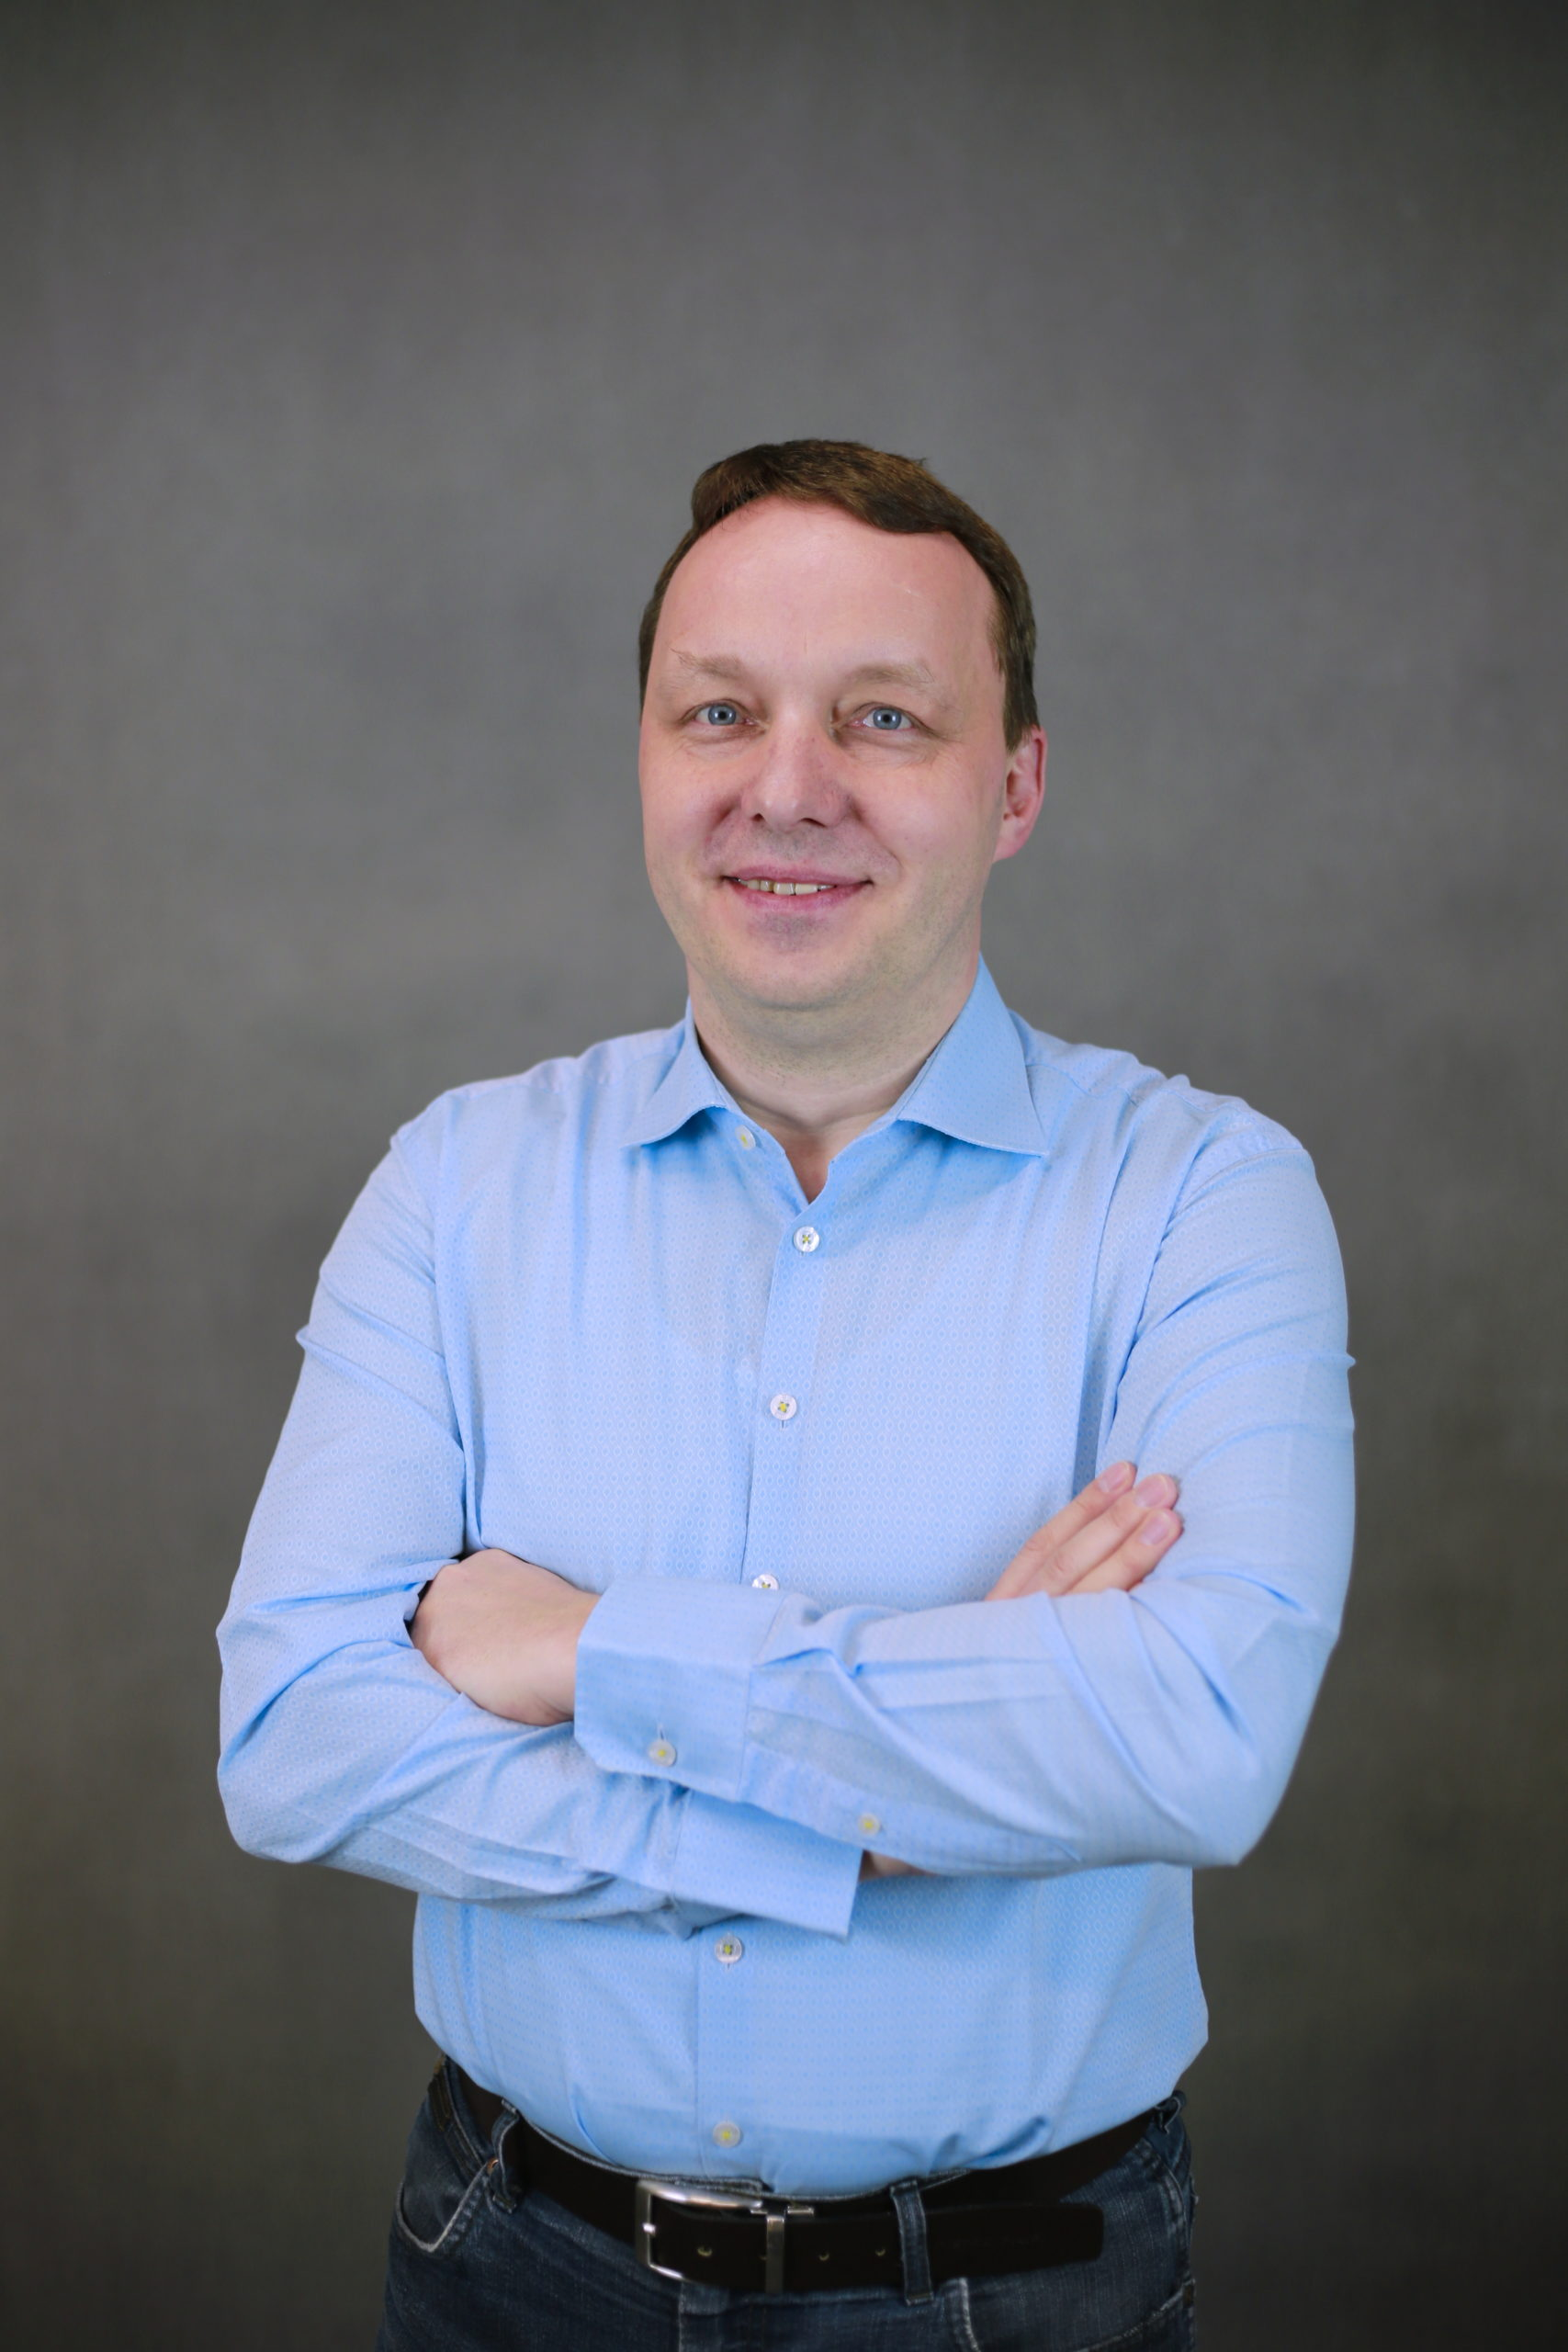 Petr Herian